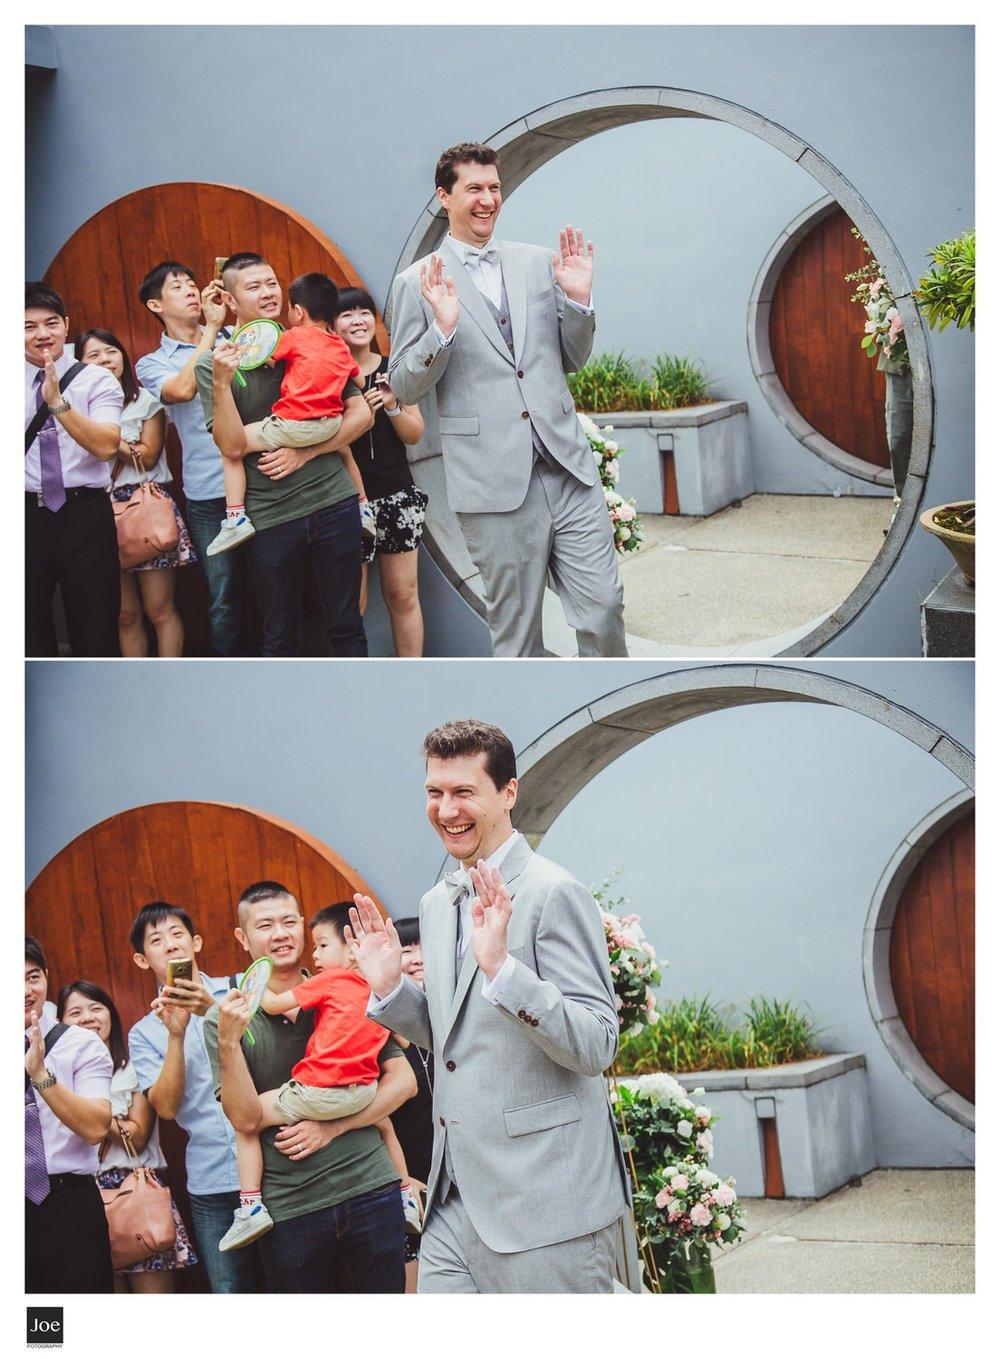 joe-fotography-the-lalu-sun-moon-lake-wedding-kay-geoffrey-121.jpg